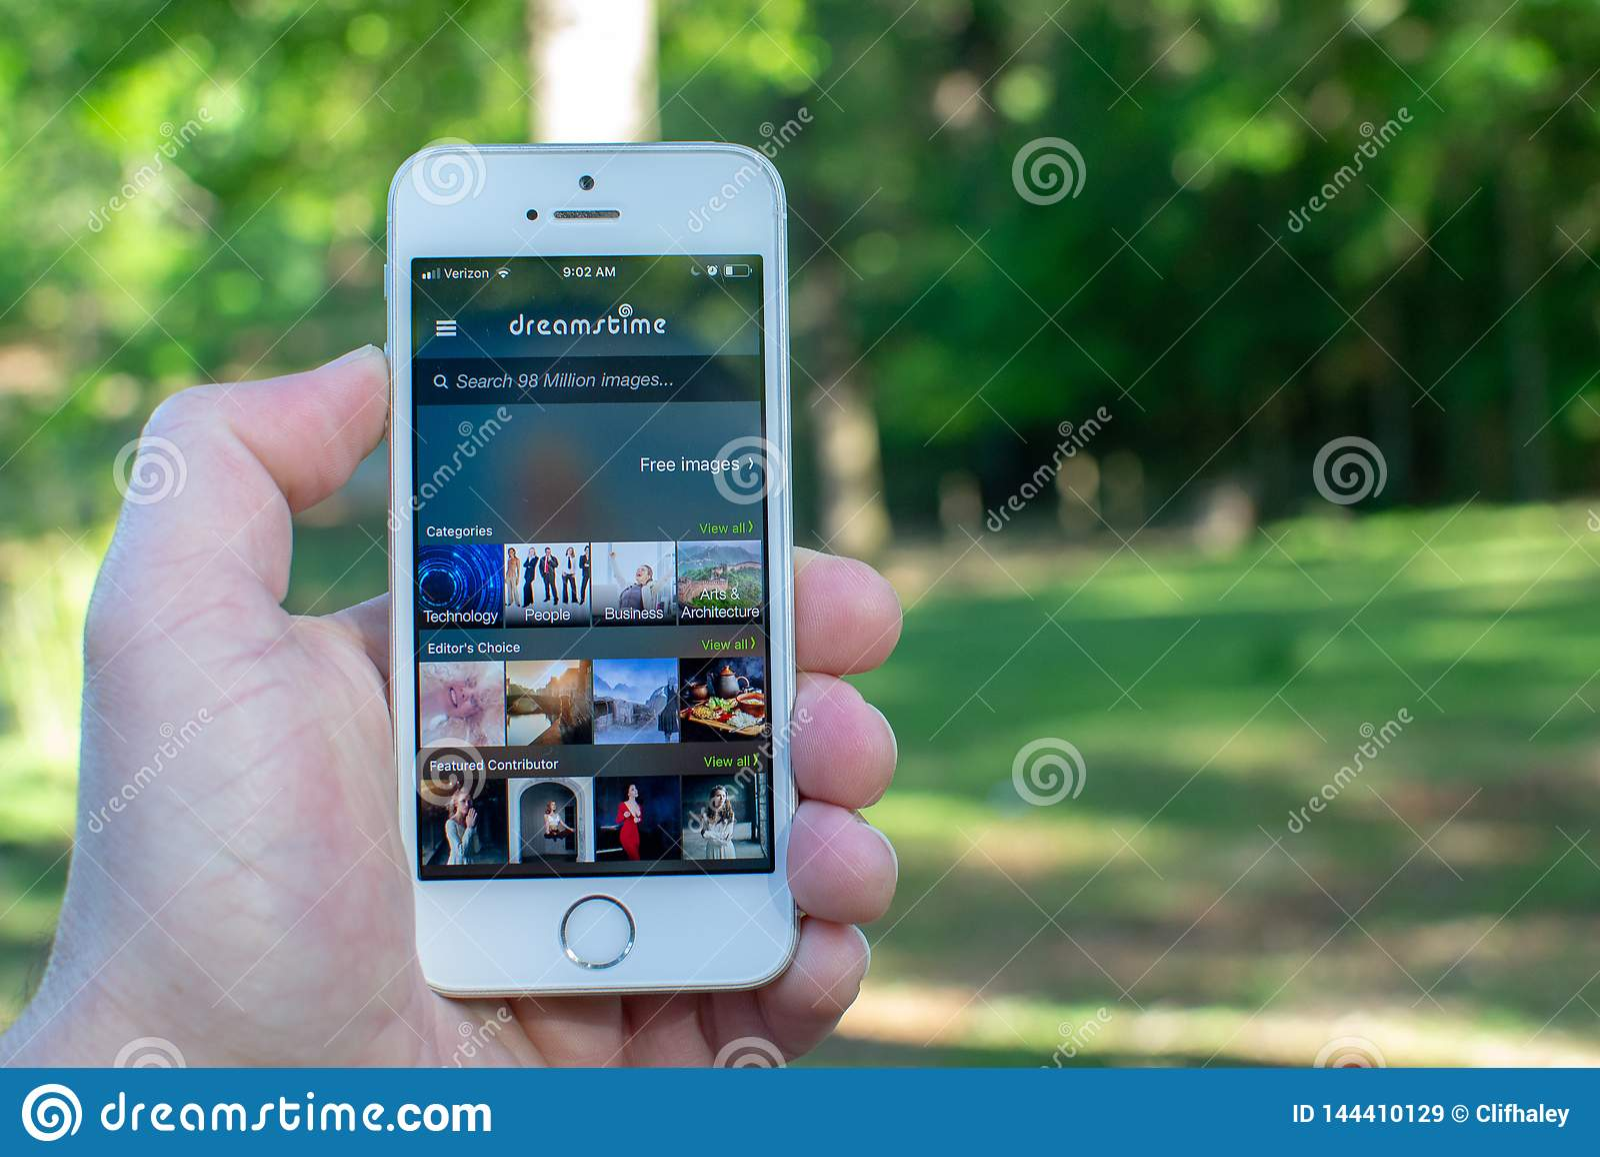 Dreamstime Mobile App on White Smartphone